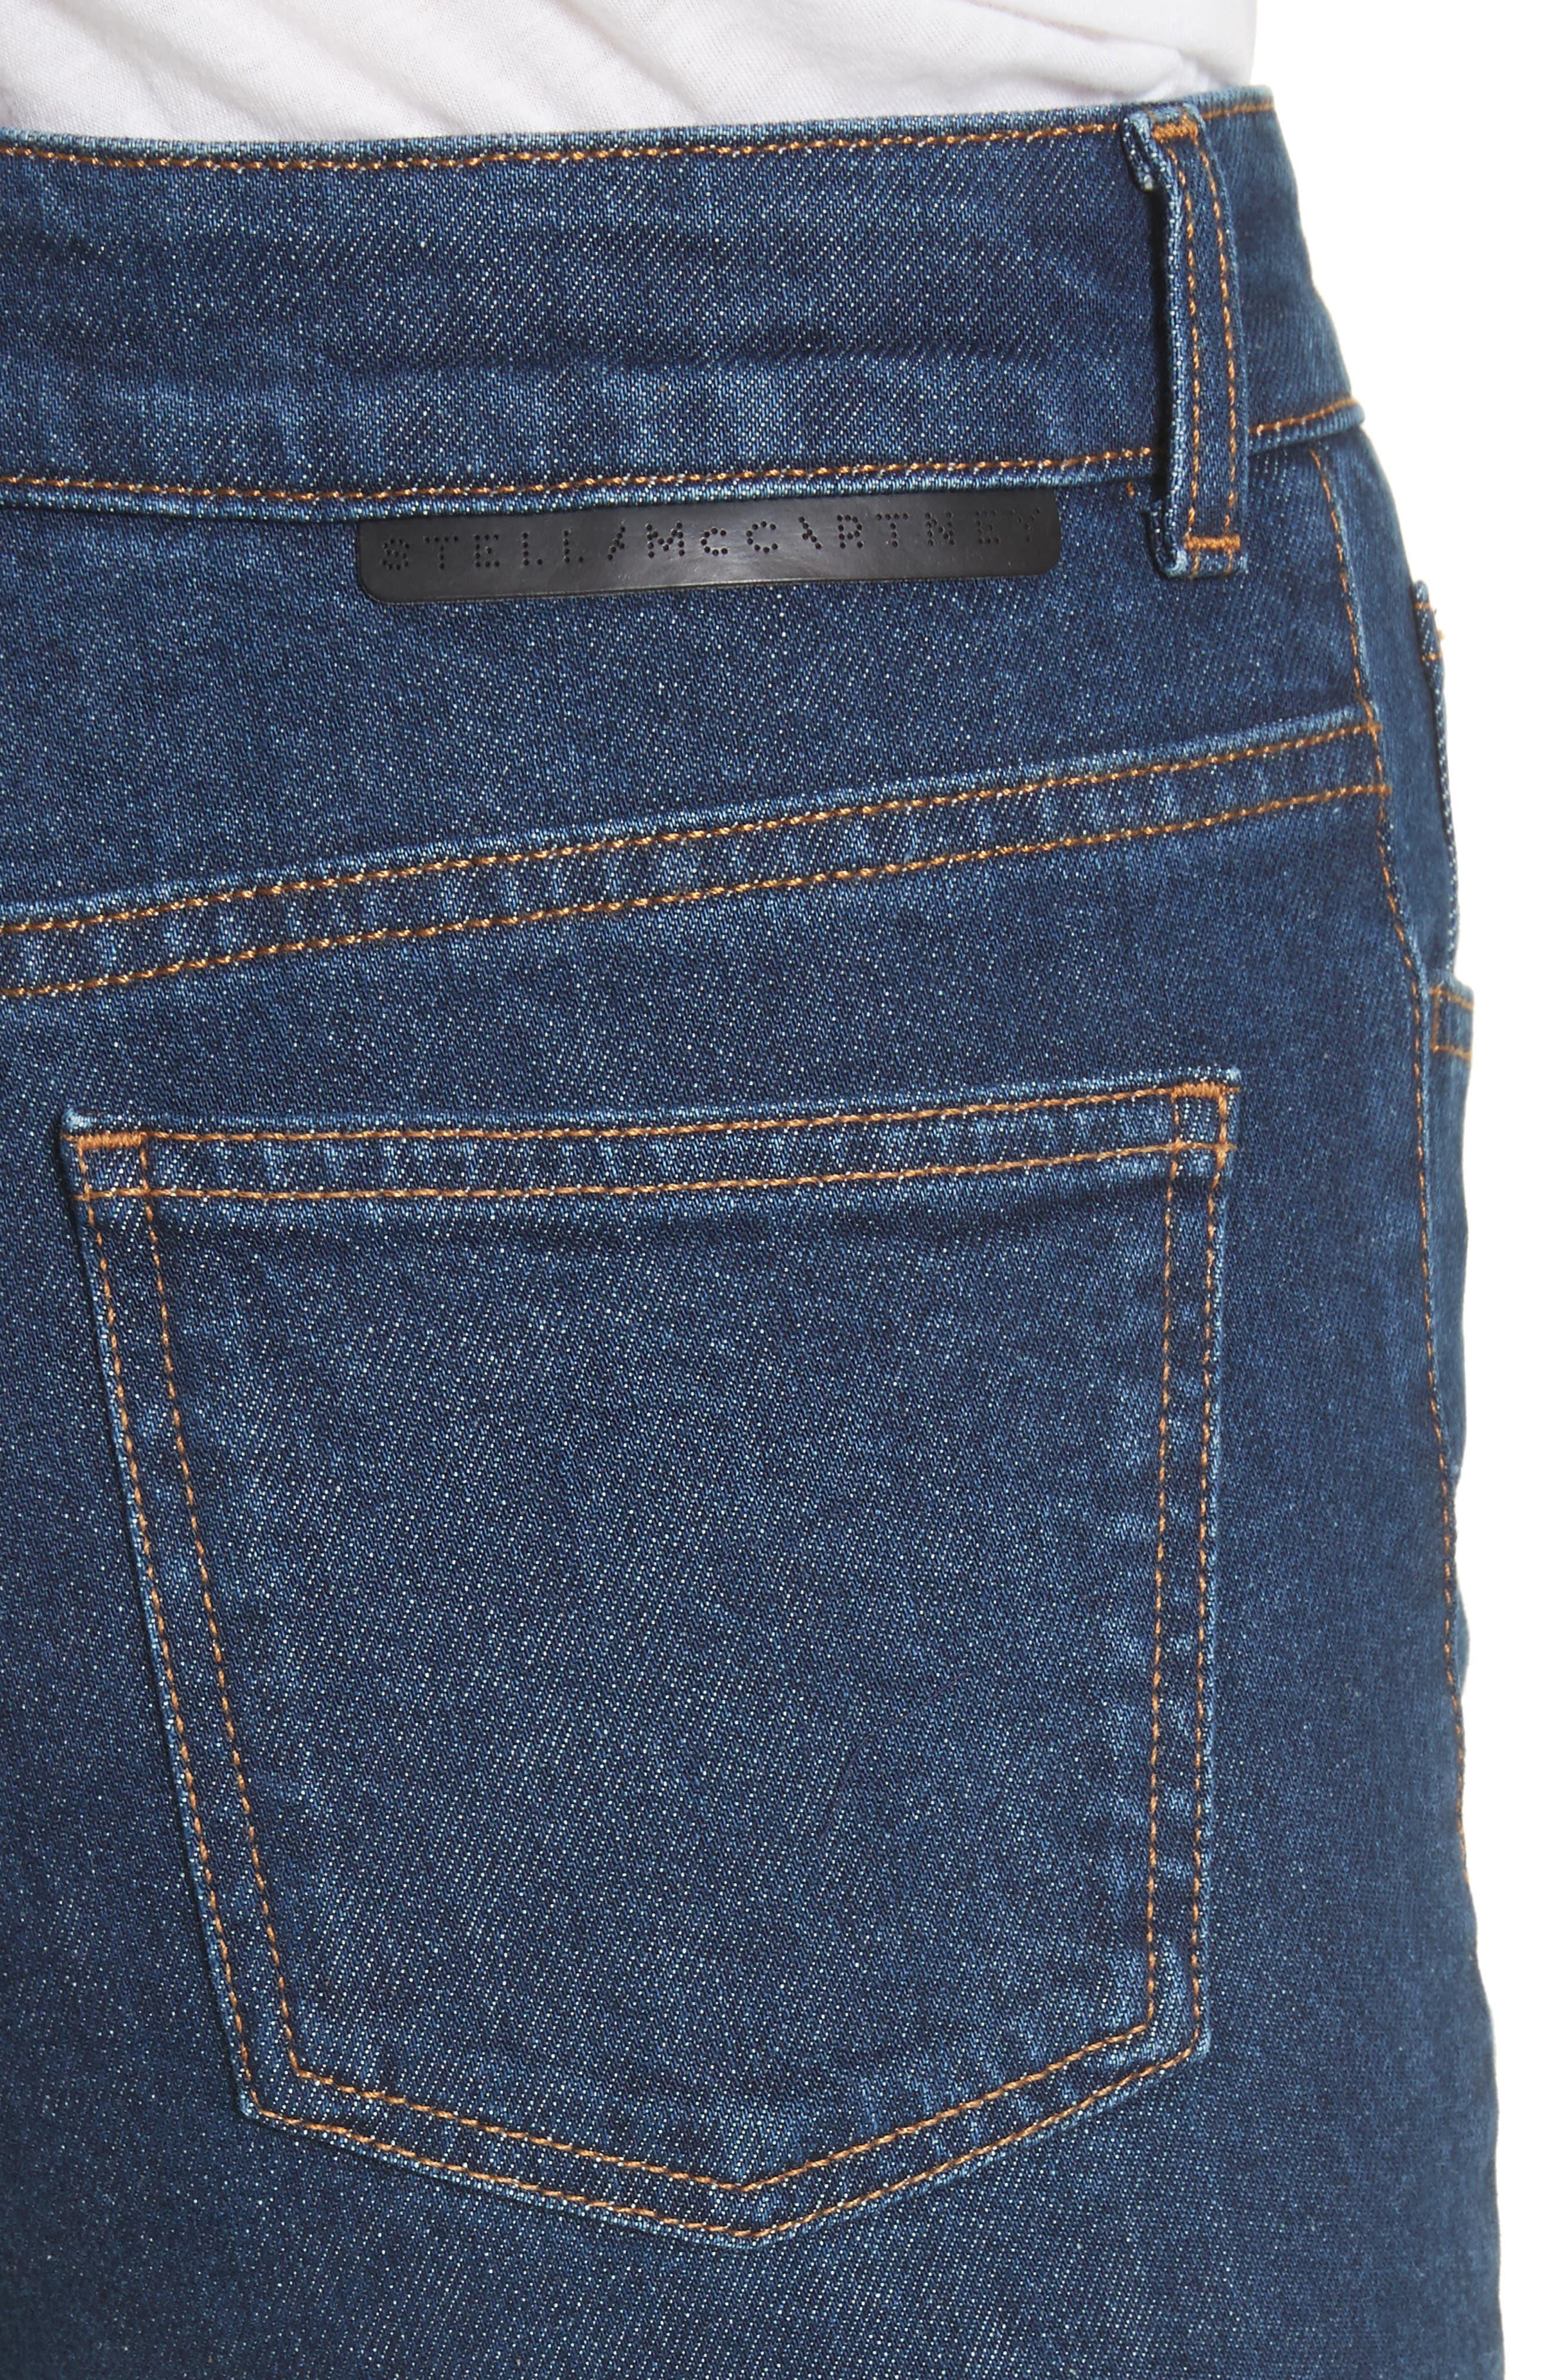 Crop Skinny Jeans,                             Alternate thumbnail 4, color,                             465